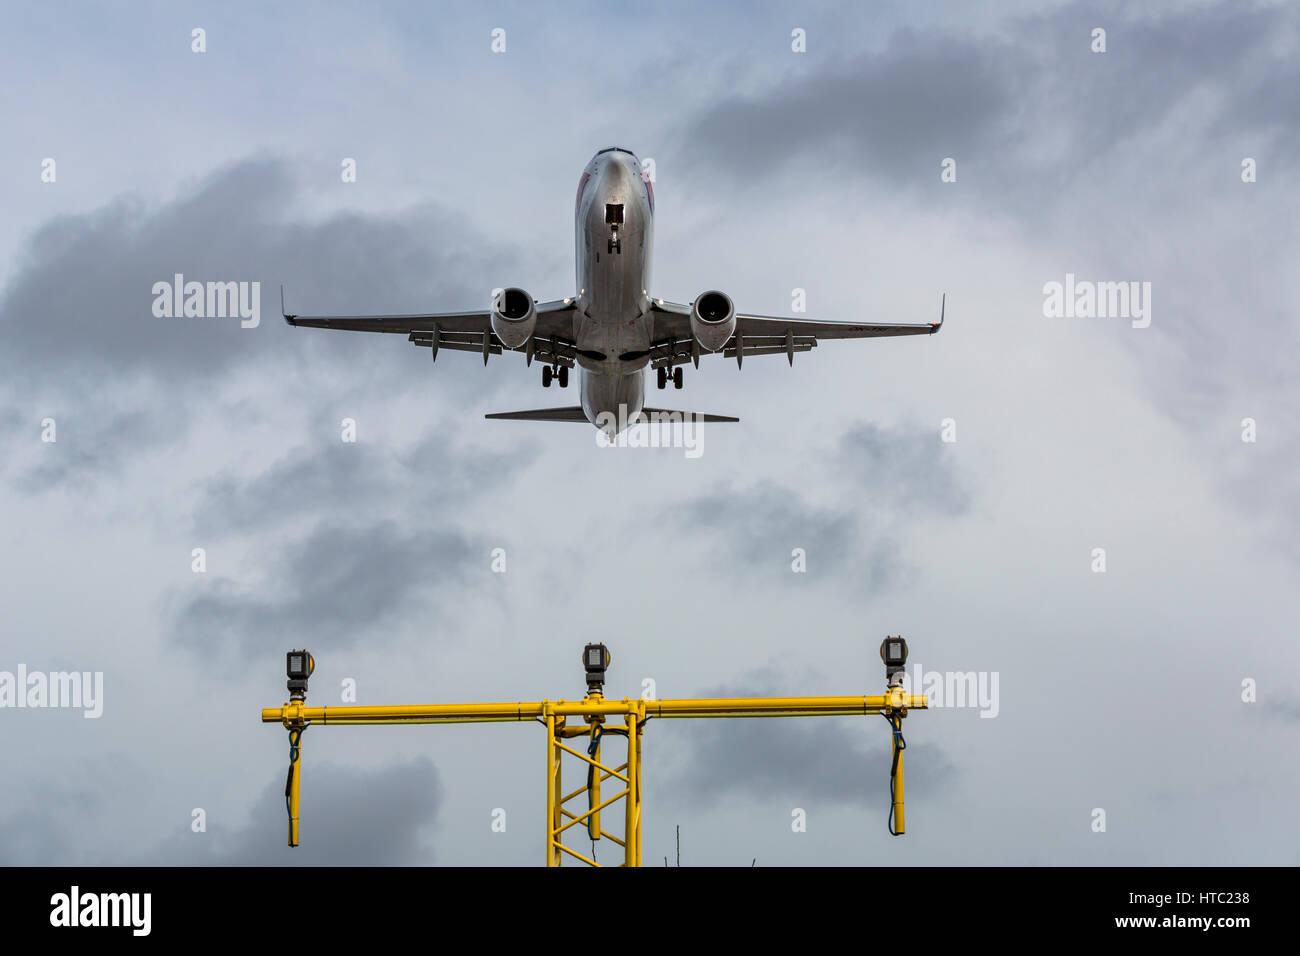 A jet aircraft landing at London Gatwick airport, England UK - Stock Image